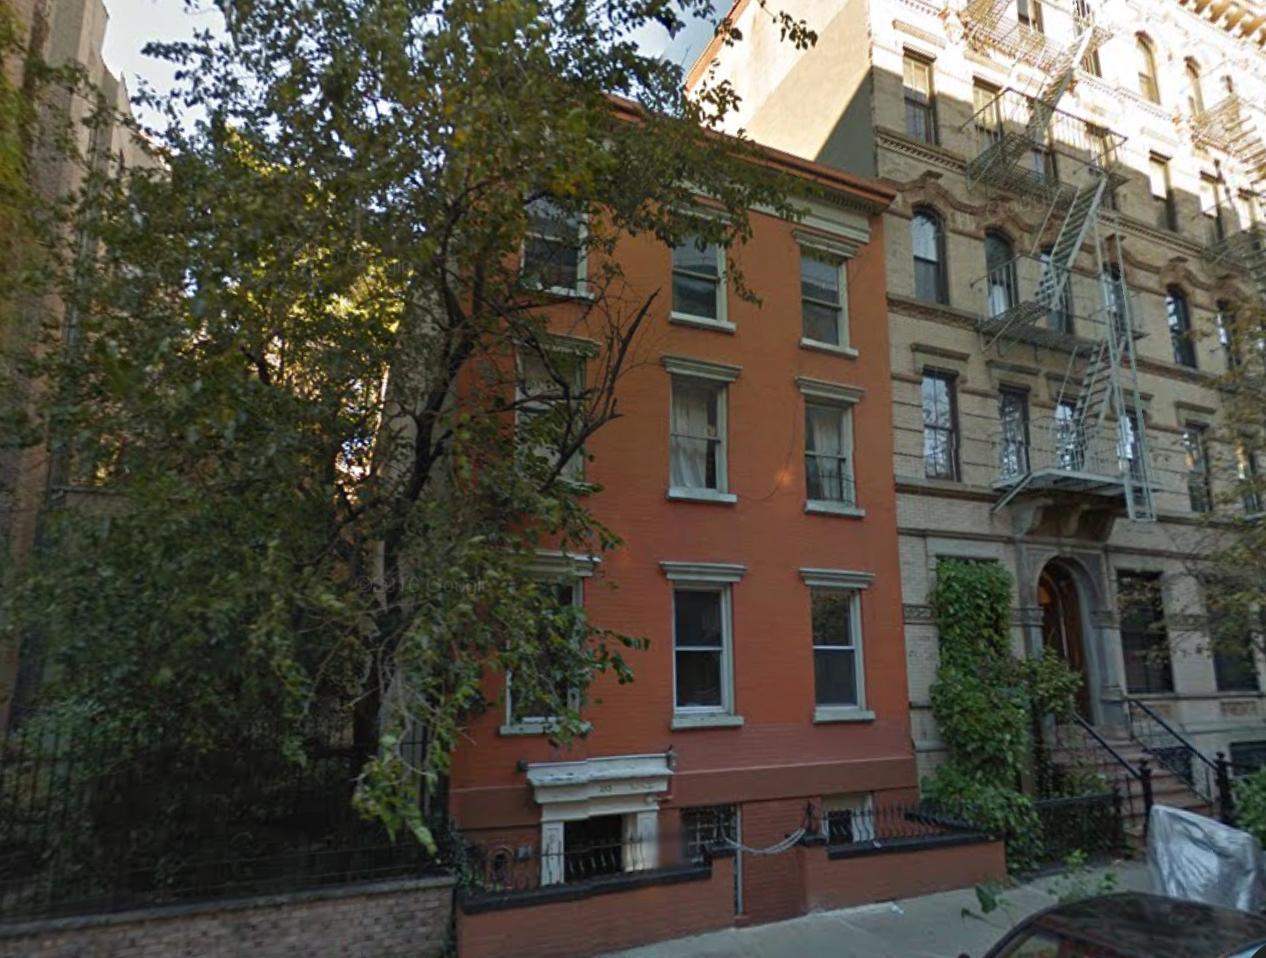 Pre-demolition 253 East 7th Street, image via Google Maps